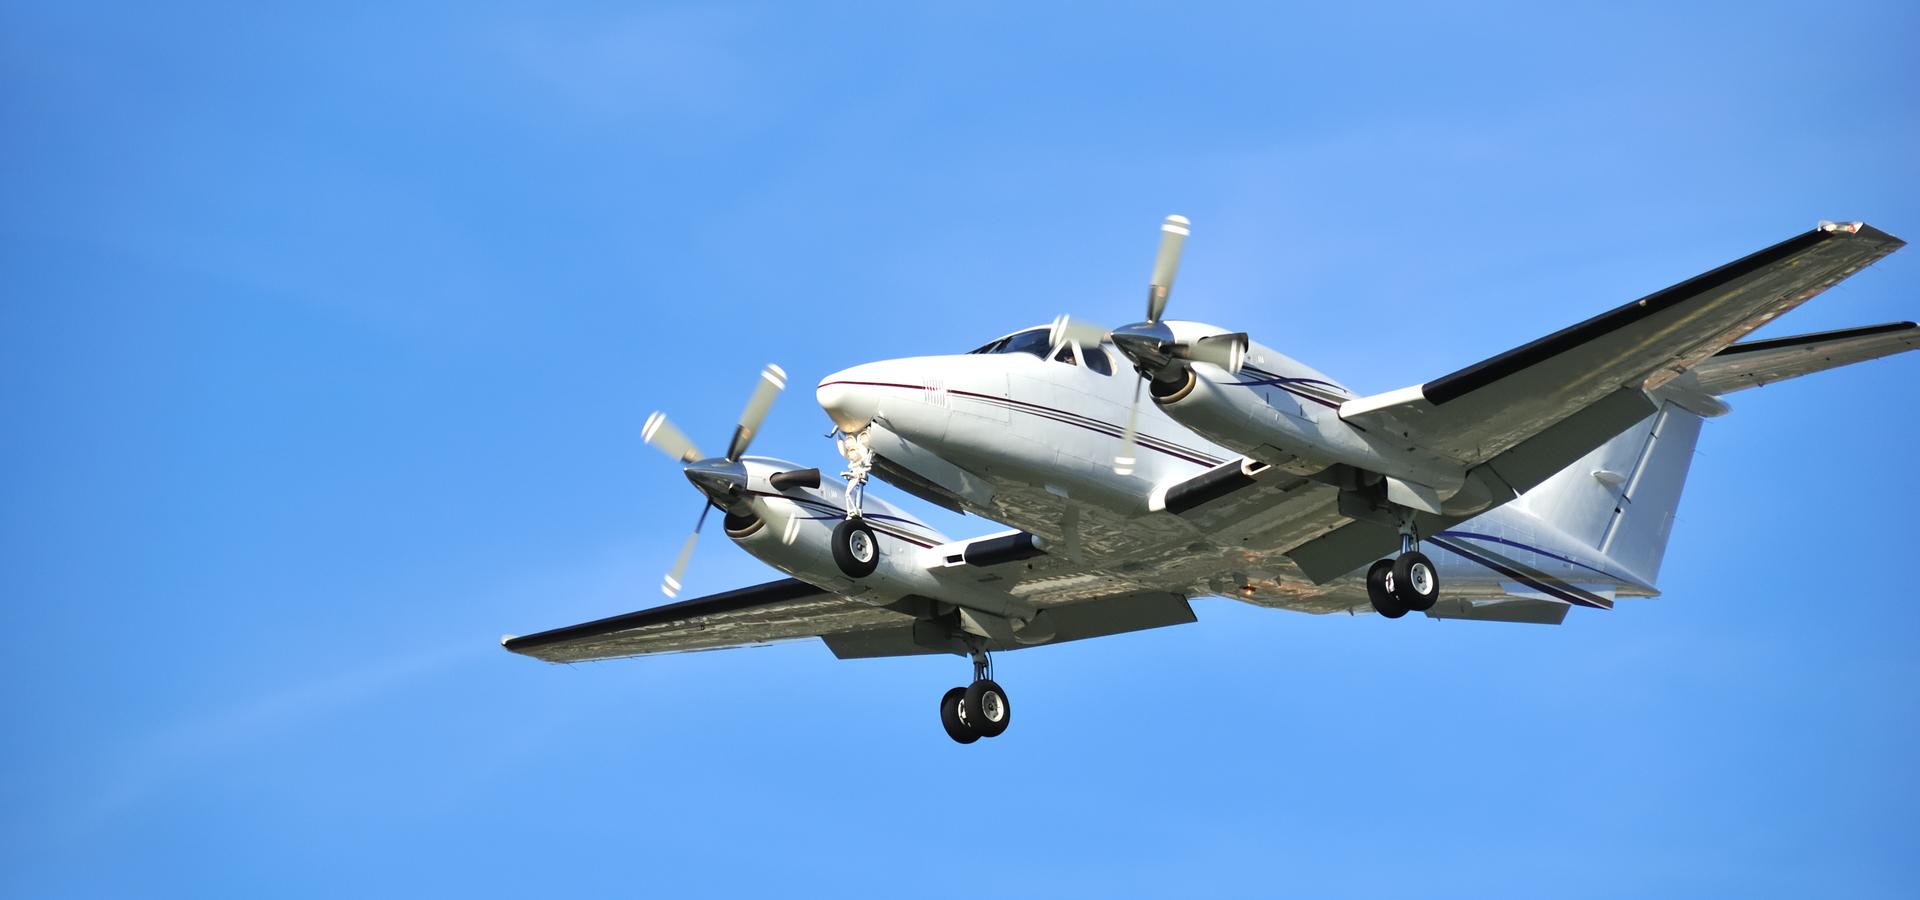 Gama Aviation Air Ambulance